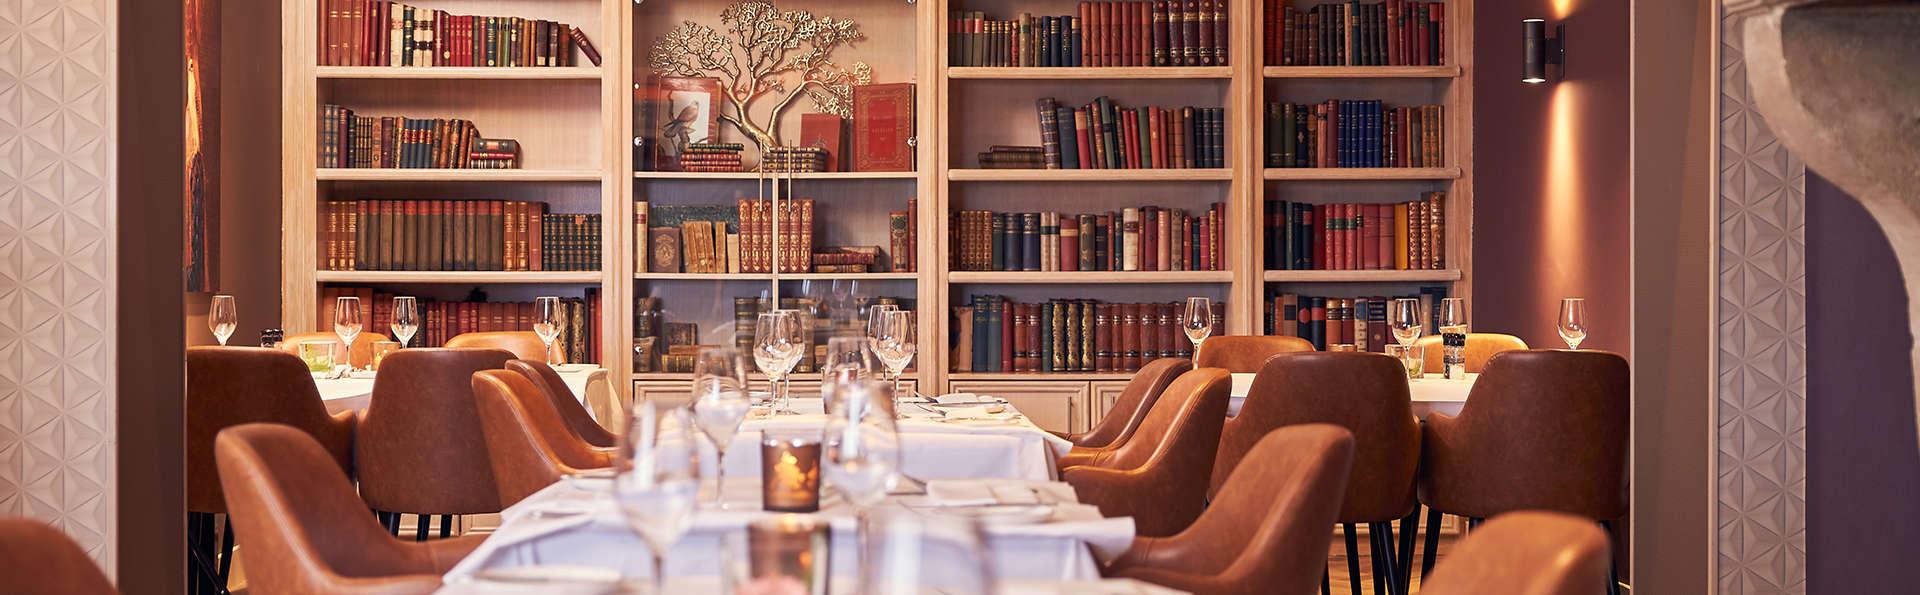 Van der Valk Groningen - Westerbroek - EDIT_NEW_Restaurant4.jpg